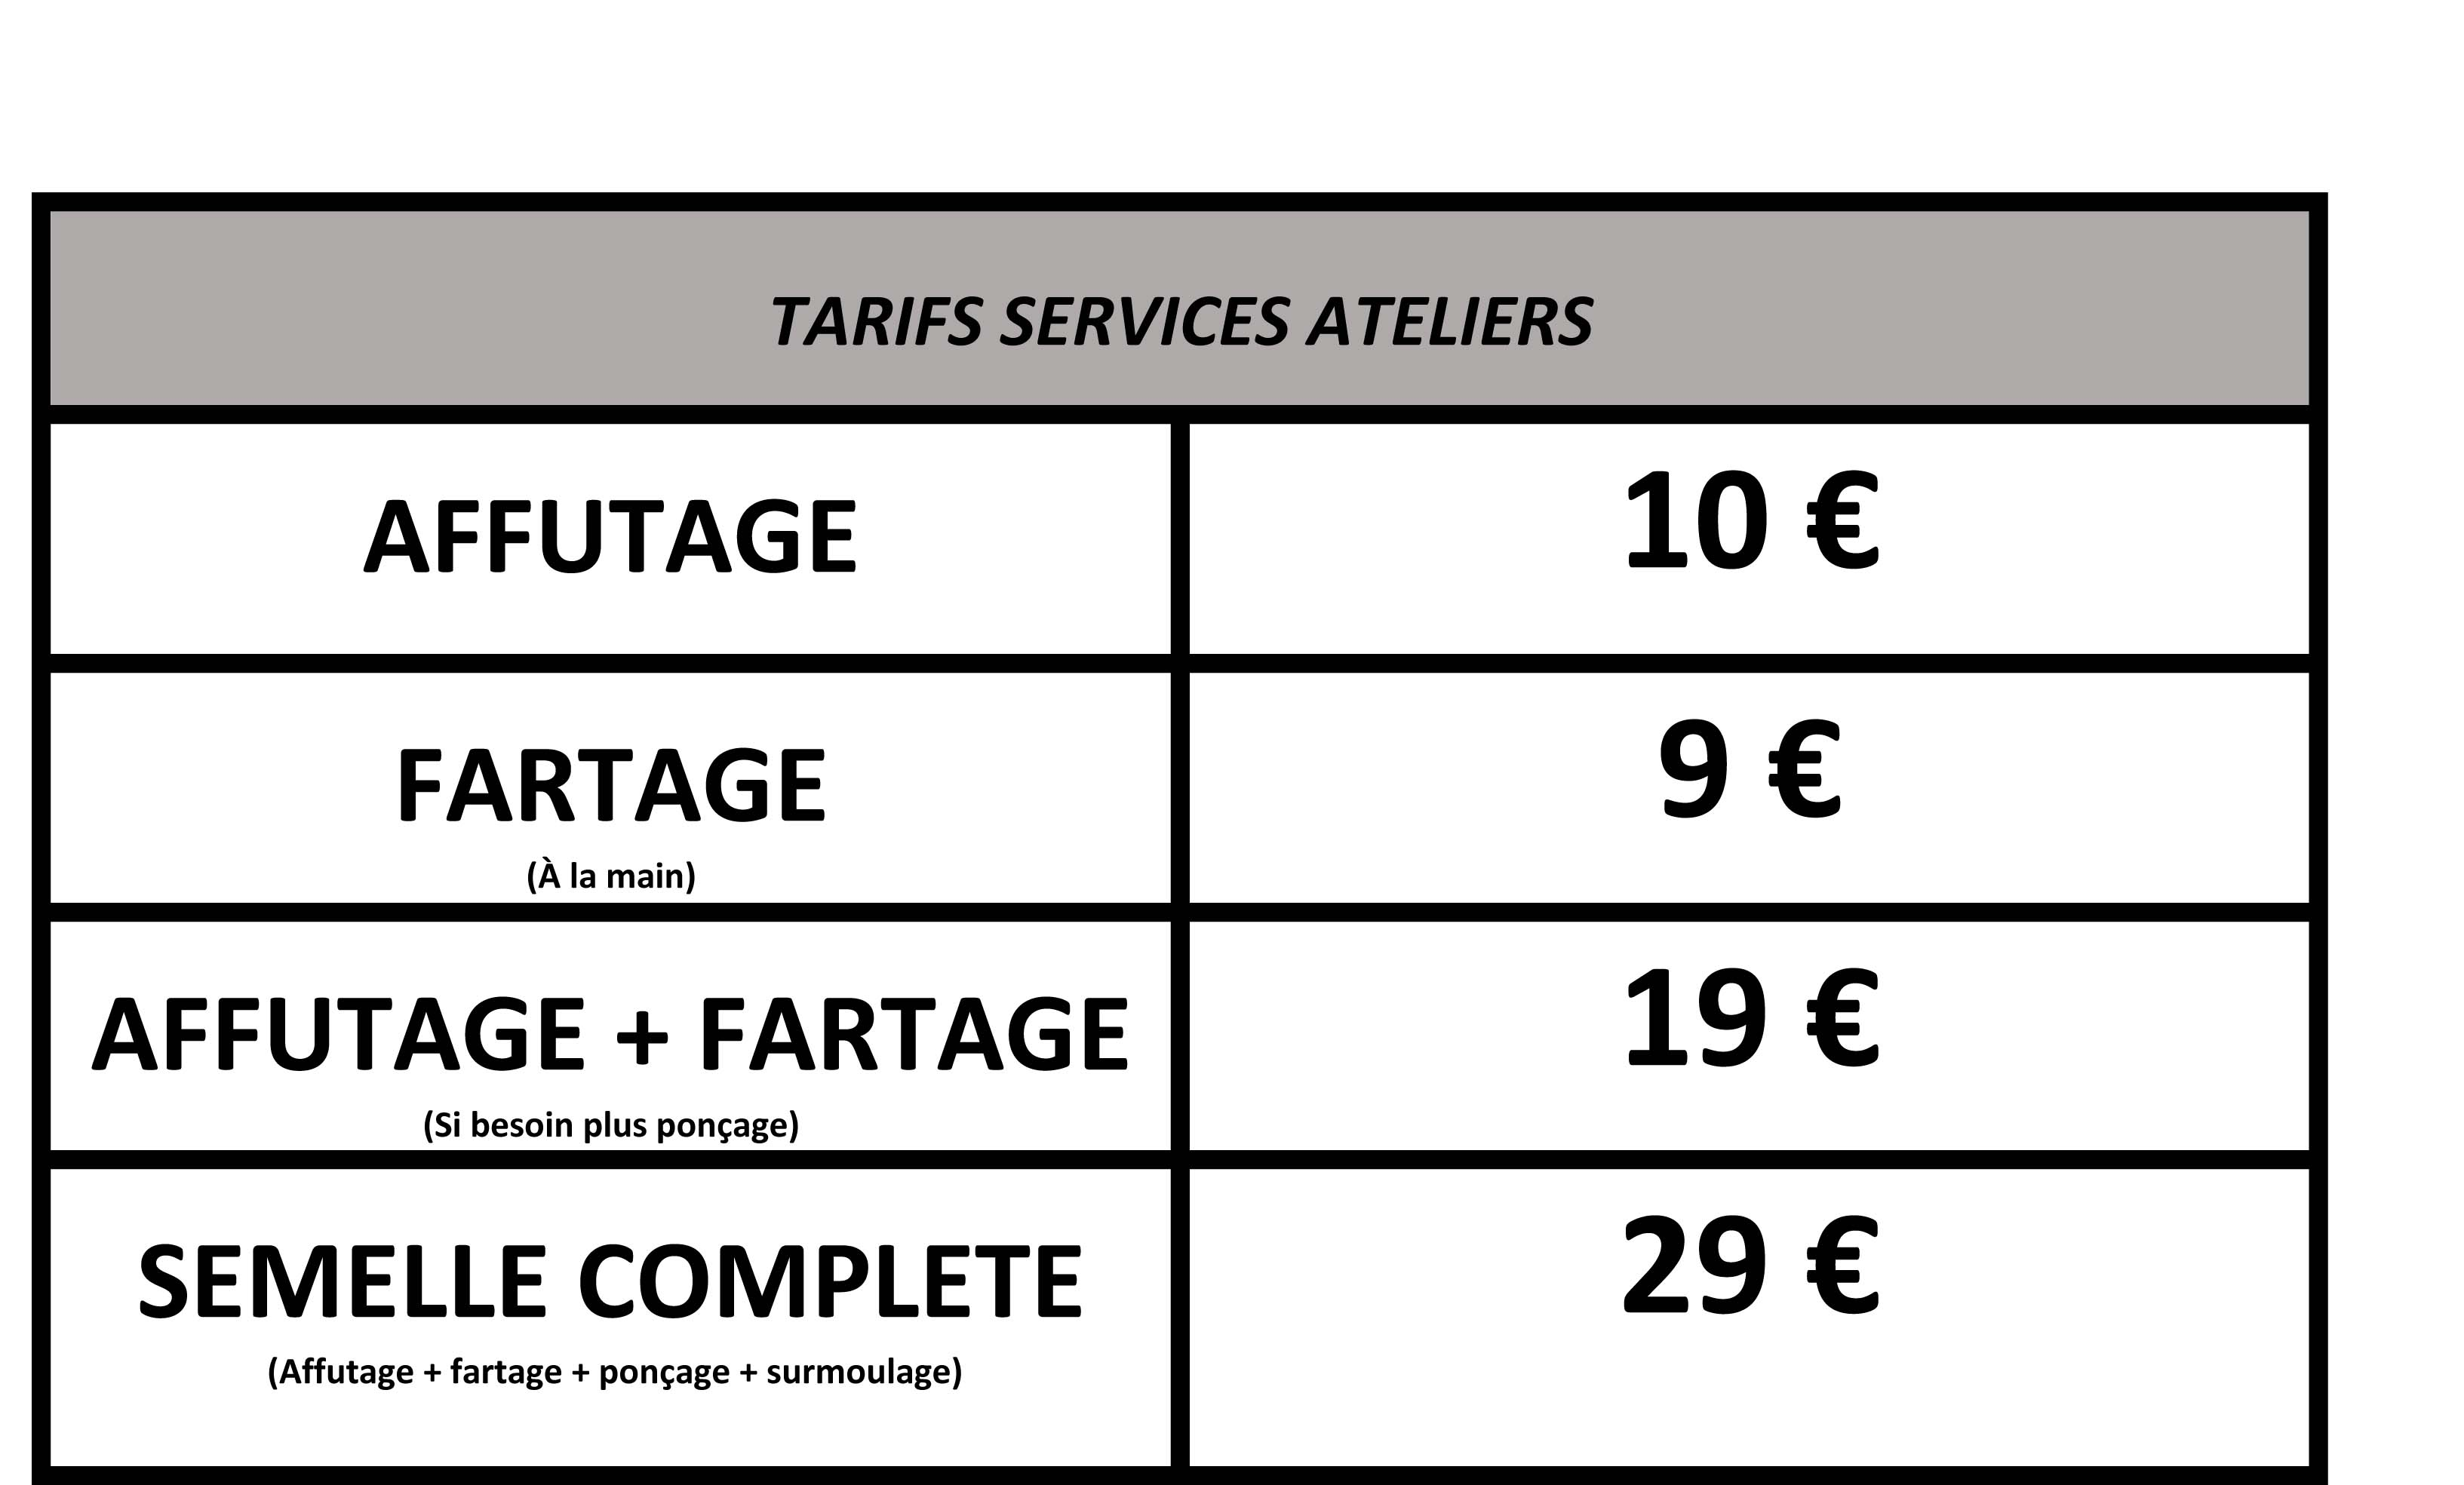 tarifs-services